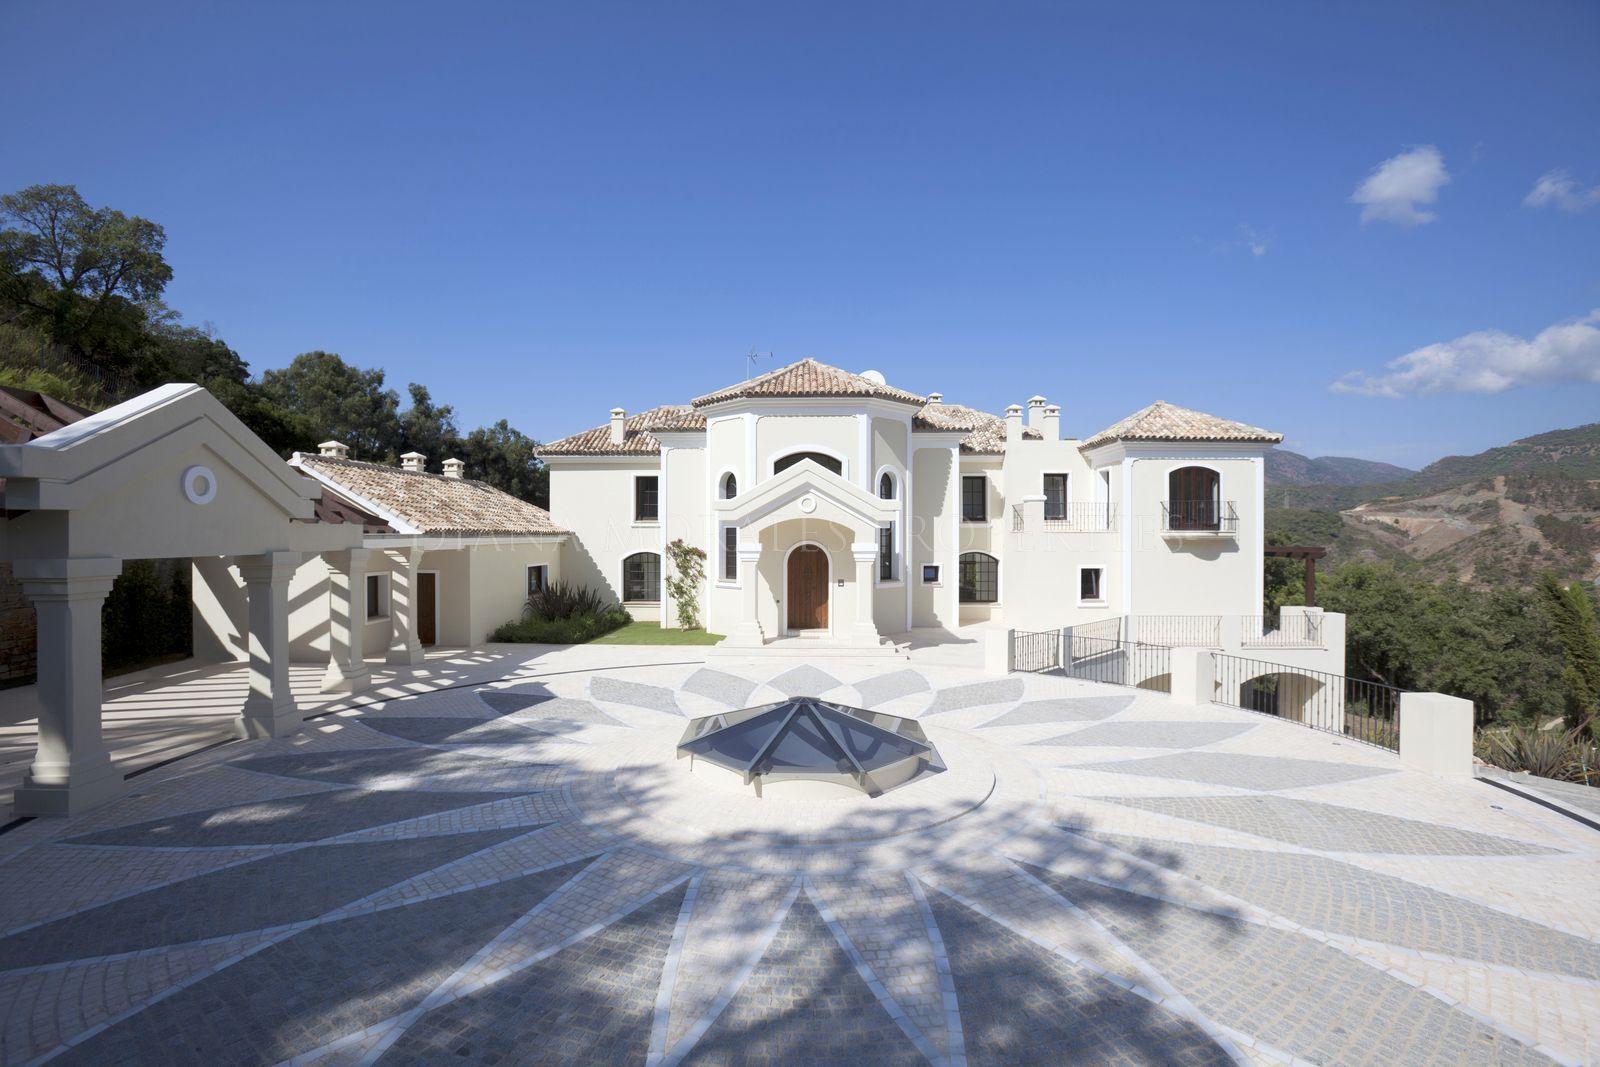 Newly Built Villa in La Zagaleta Estate - Villa, La Zagaleta, Benahavis